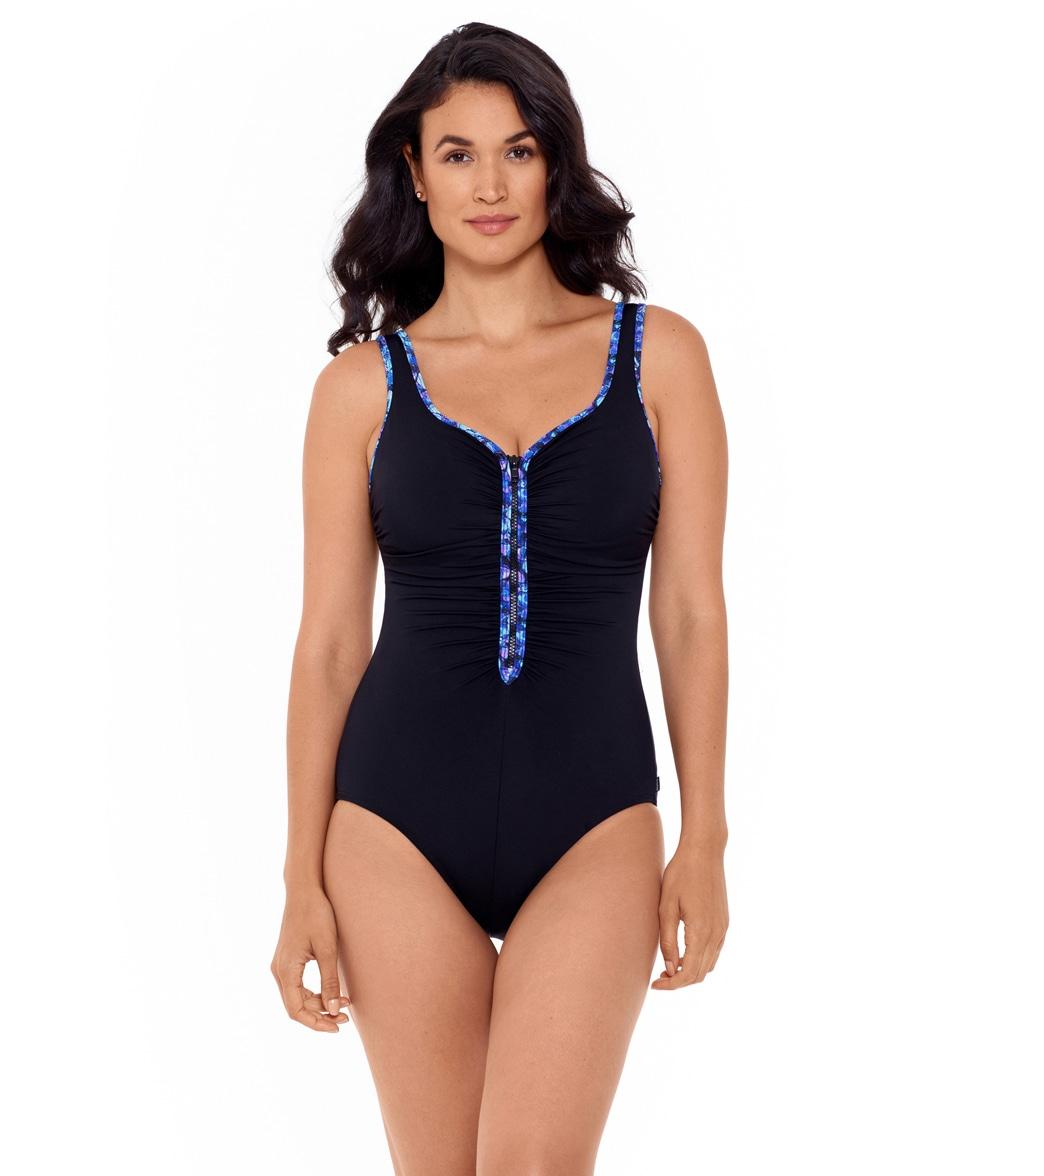 Reebok Women's Reflecting Rebel Shirred Zipper Tank Chlorine Resistant One Piece Swimsuit